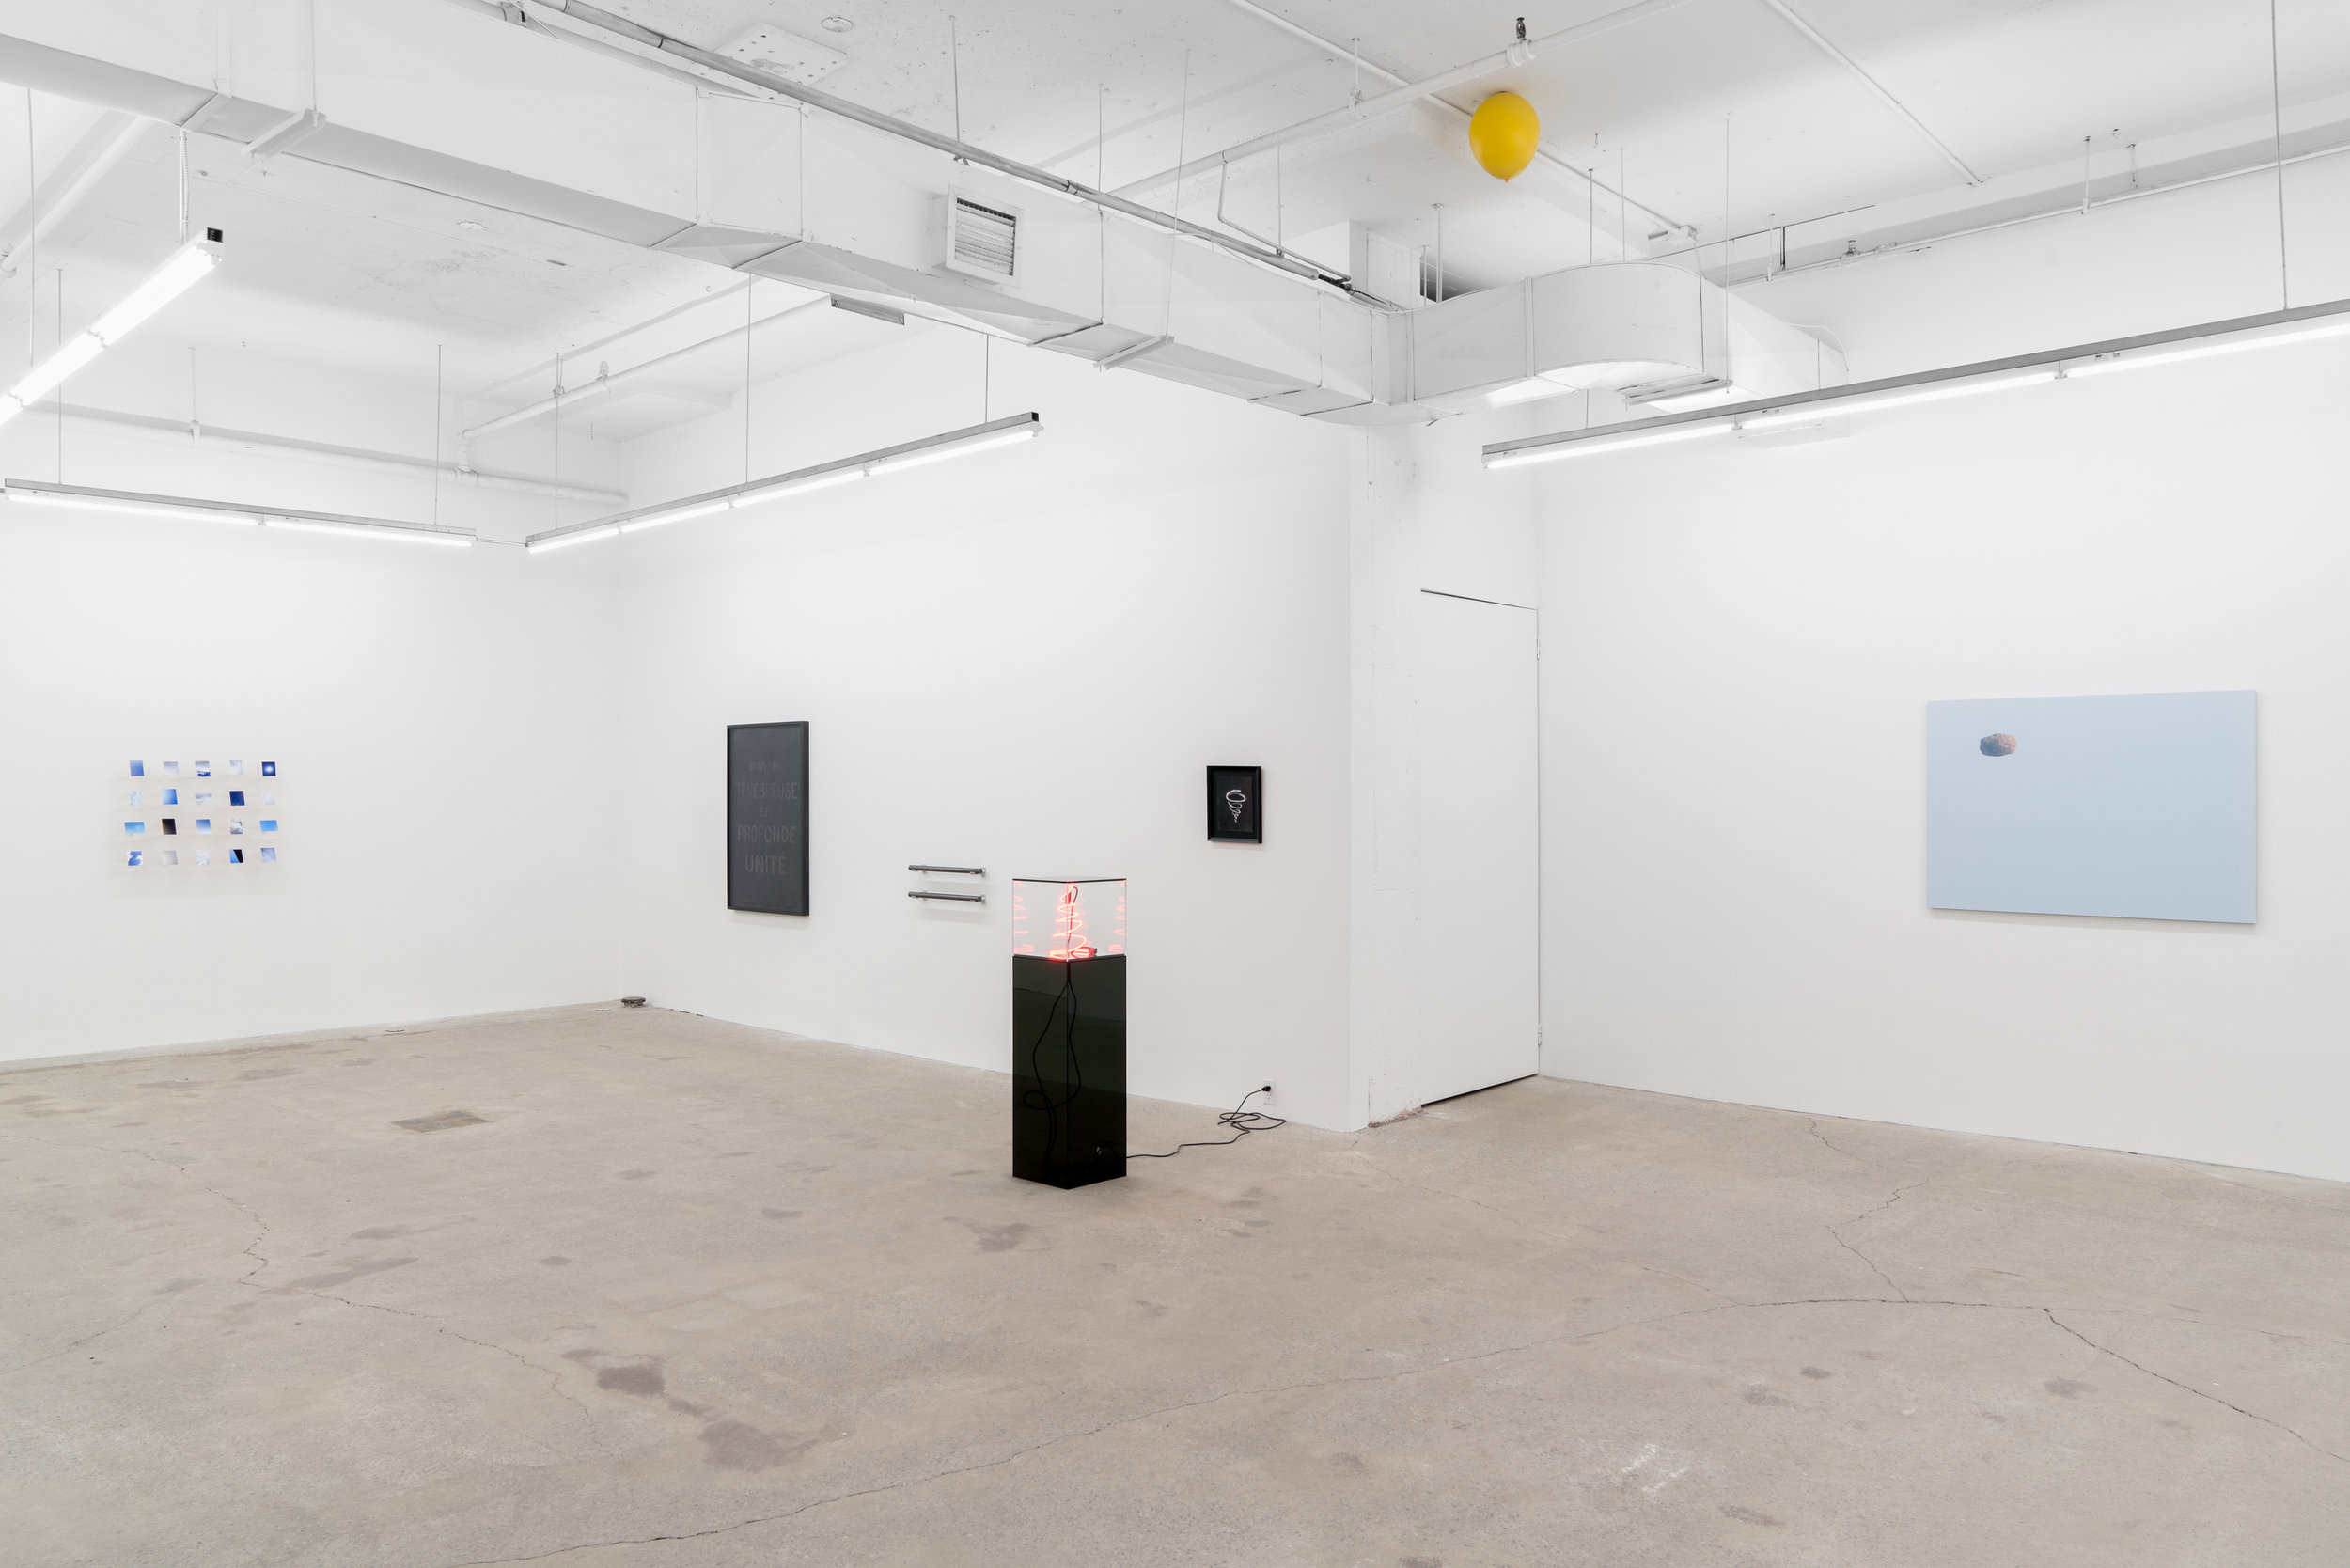 GalerieNicolasRobertSummer2019 (7 of 21).jpg